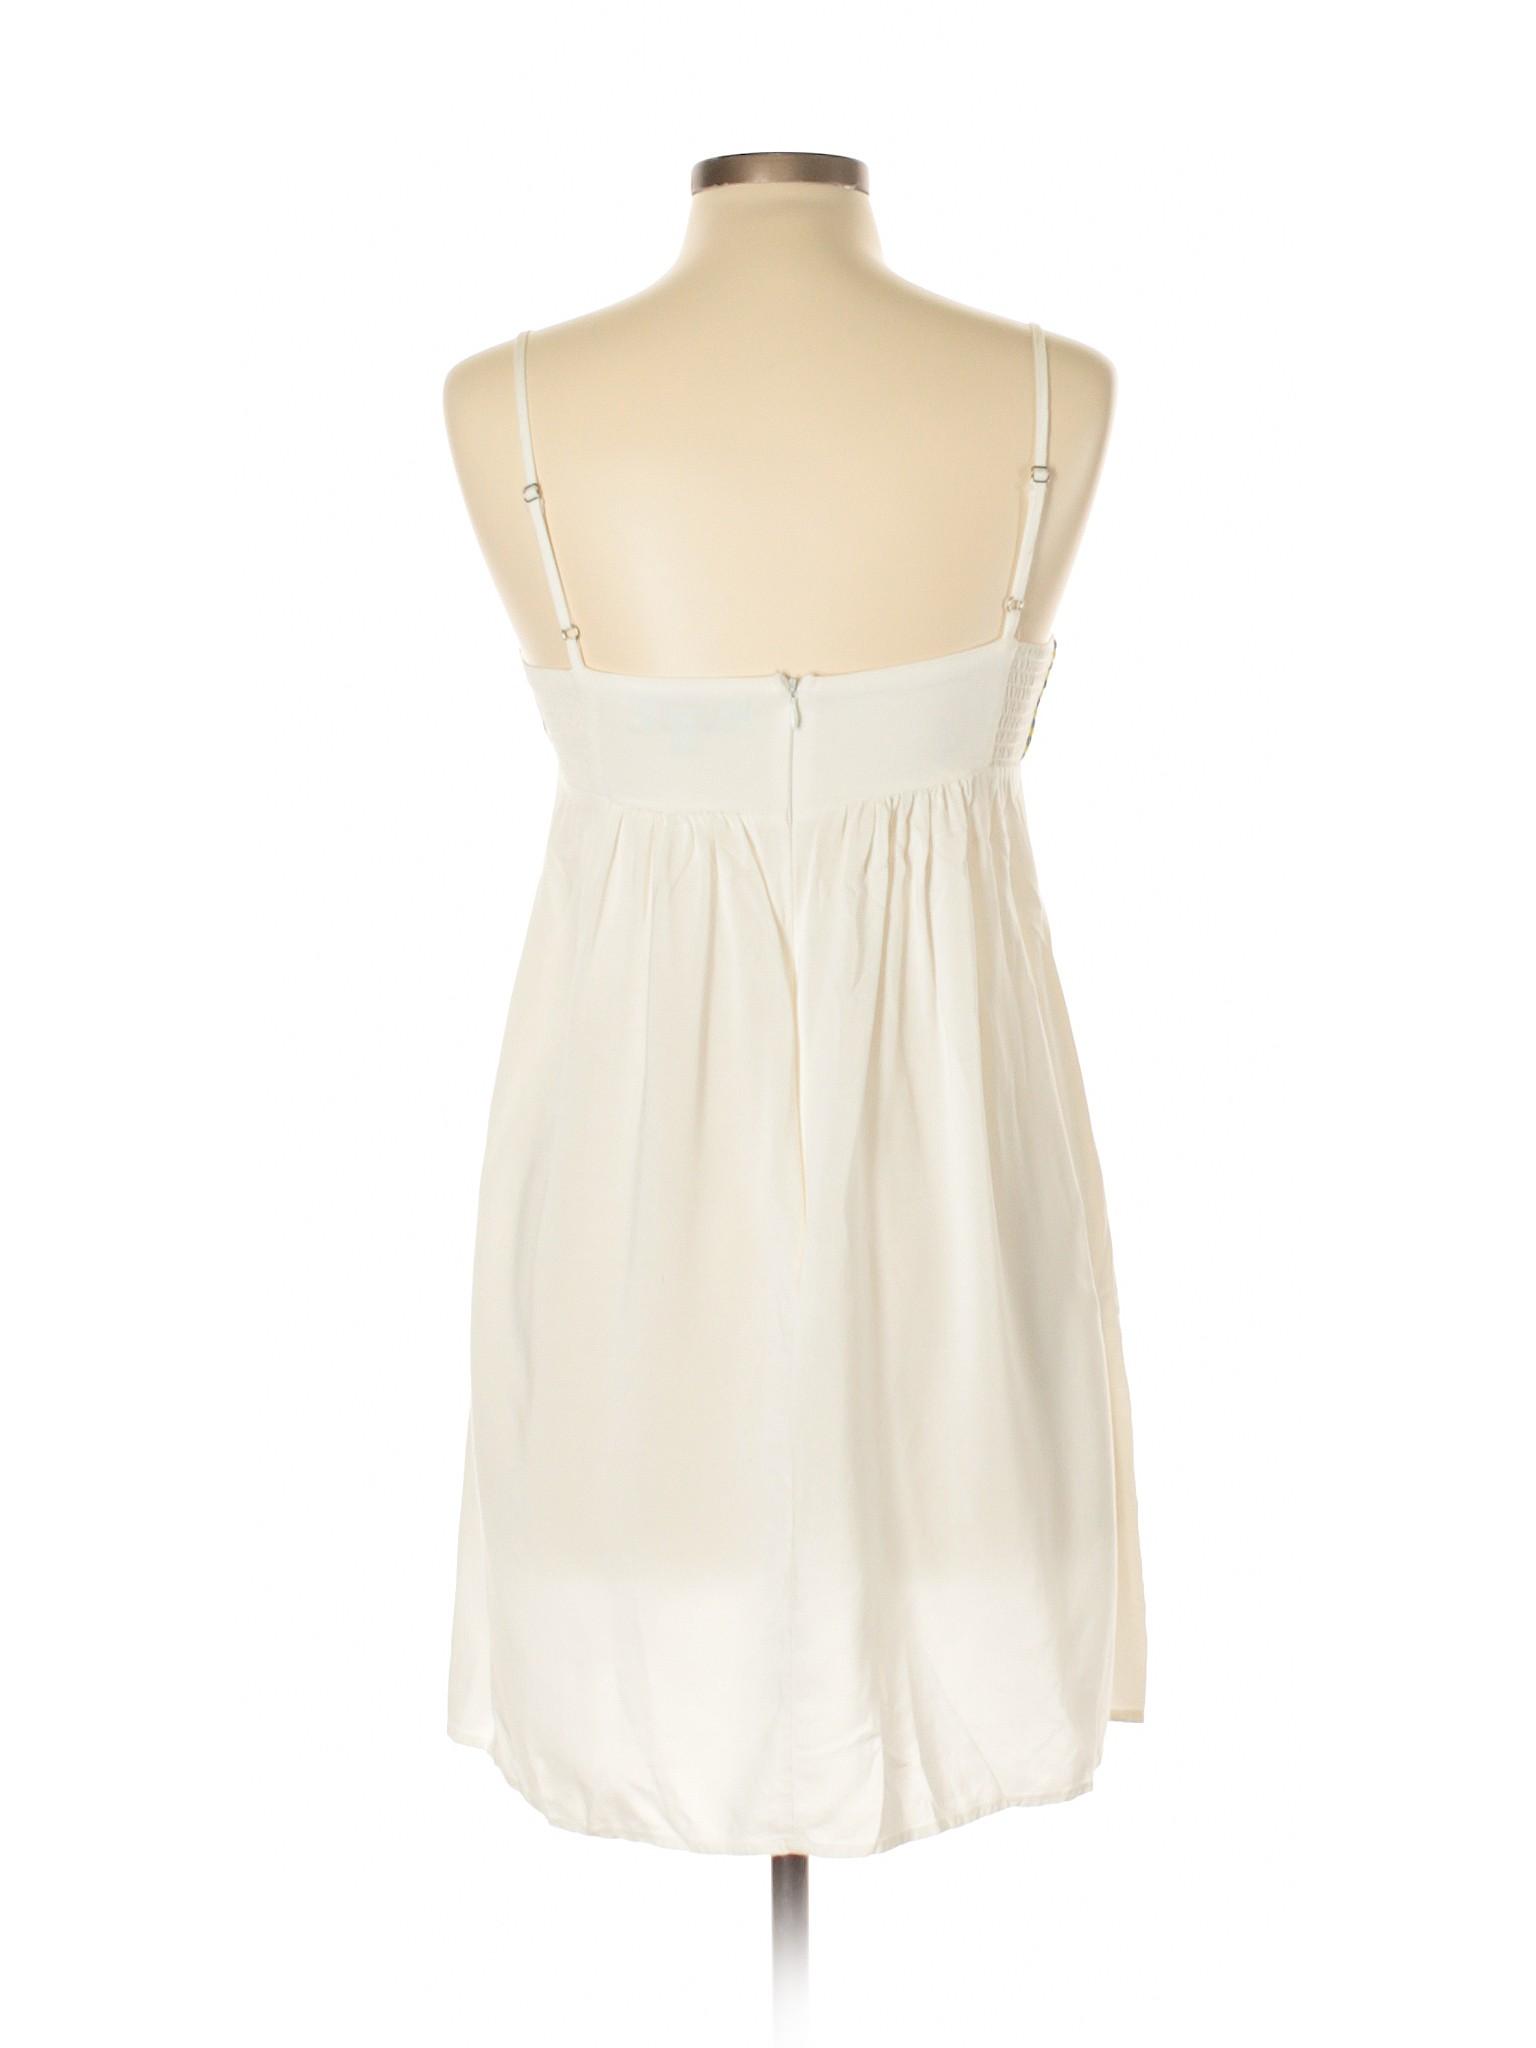 Karlie Selling Selling Karlie Selling Dress Casual Dress Casual SqxO5gS